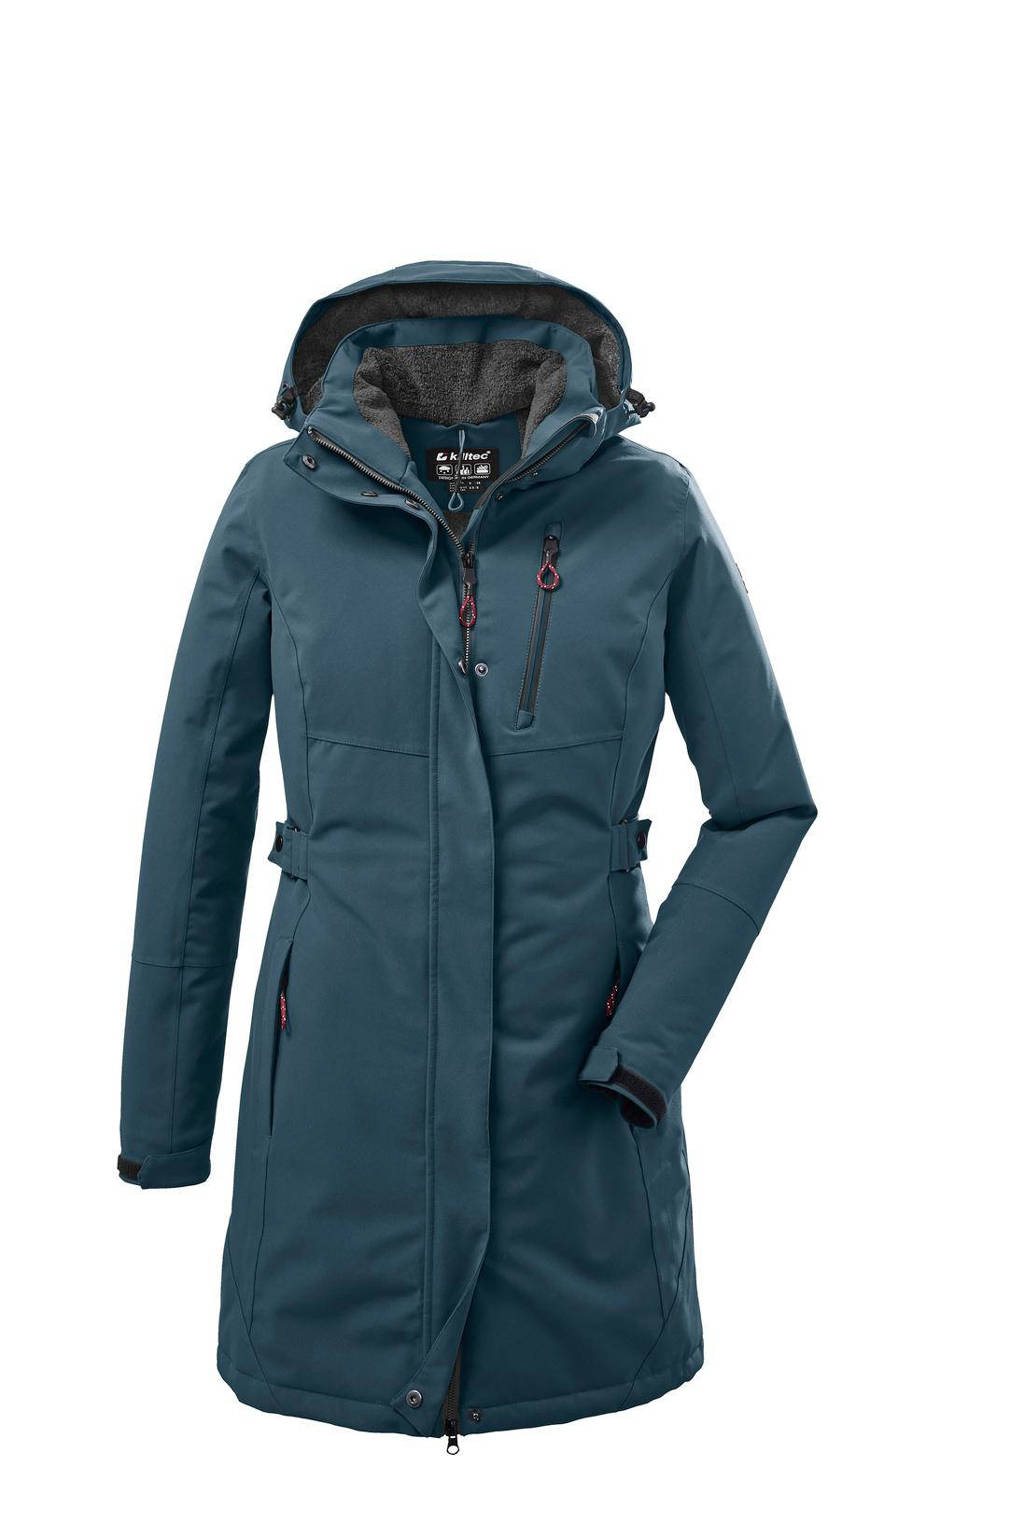 Killtec outdoor jas donkerblauw, Donkerblauw